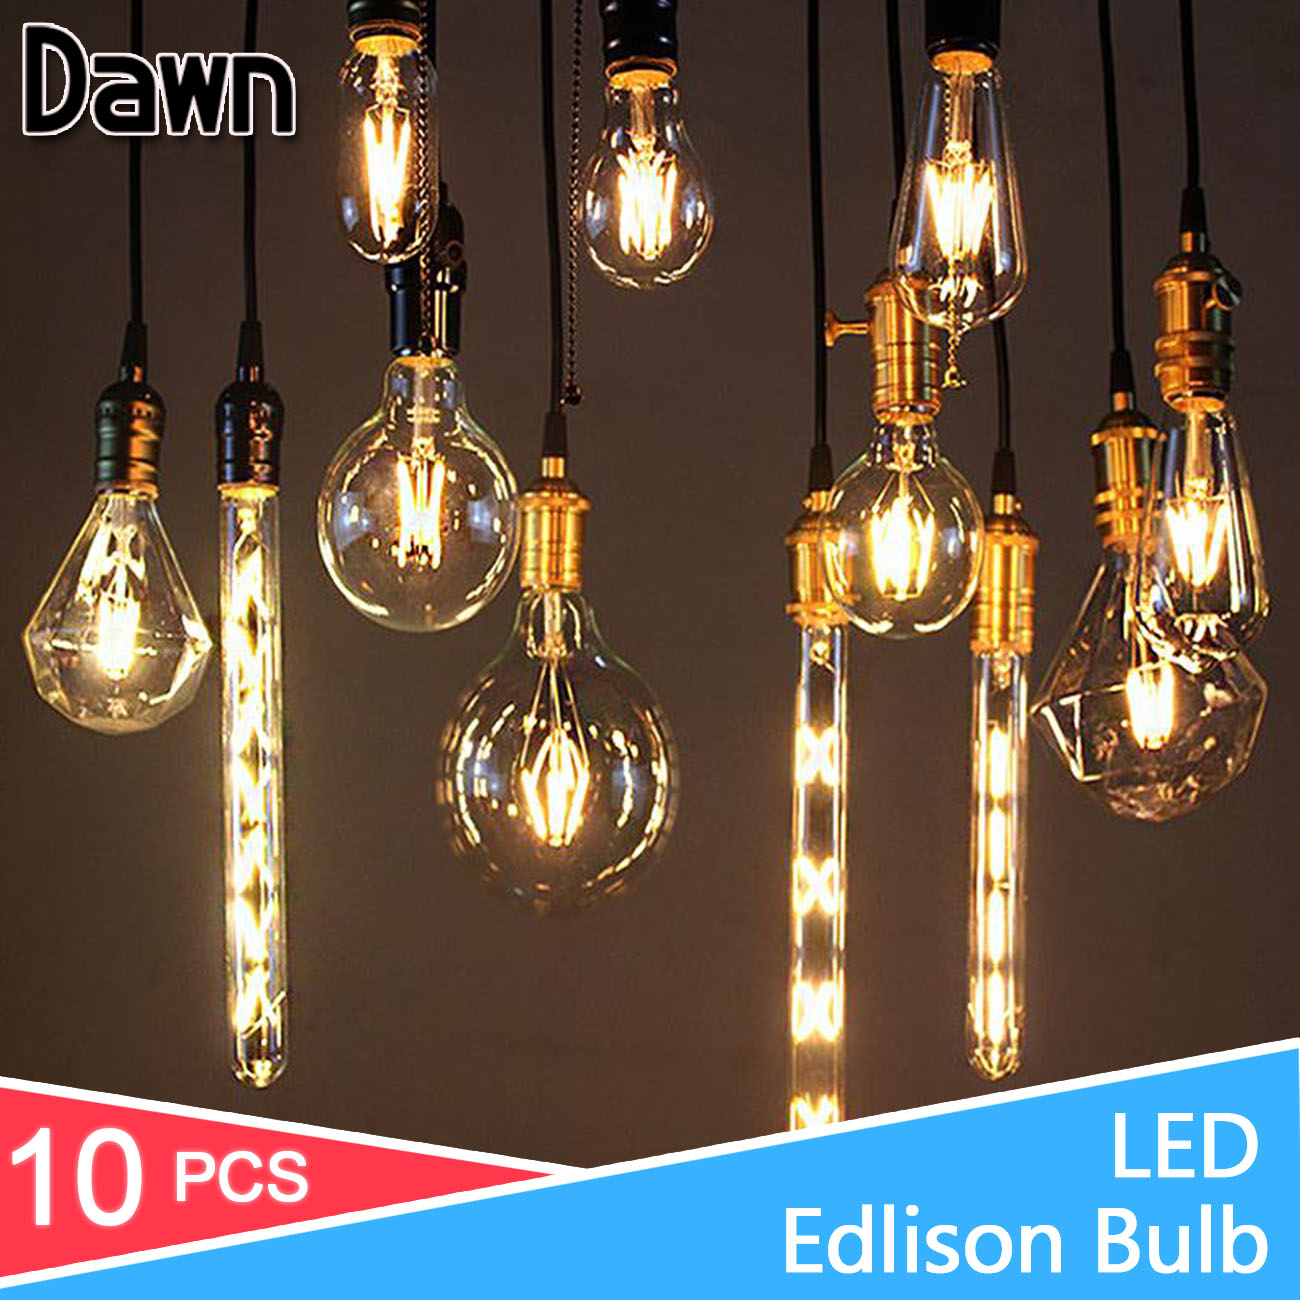 Vintage edison bulb old fashioned lamp classic a60 led 2w or 4w - 10pcs Antique Led Lamp 220v Filament Light E27 E14 Led Bulb 2w 4w 6w 8w Vintage